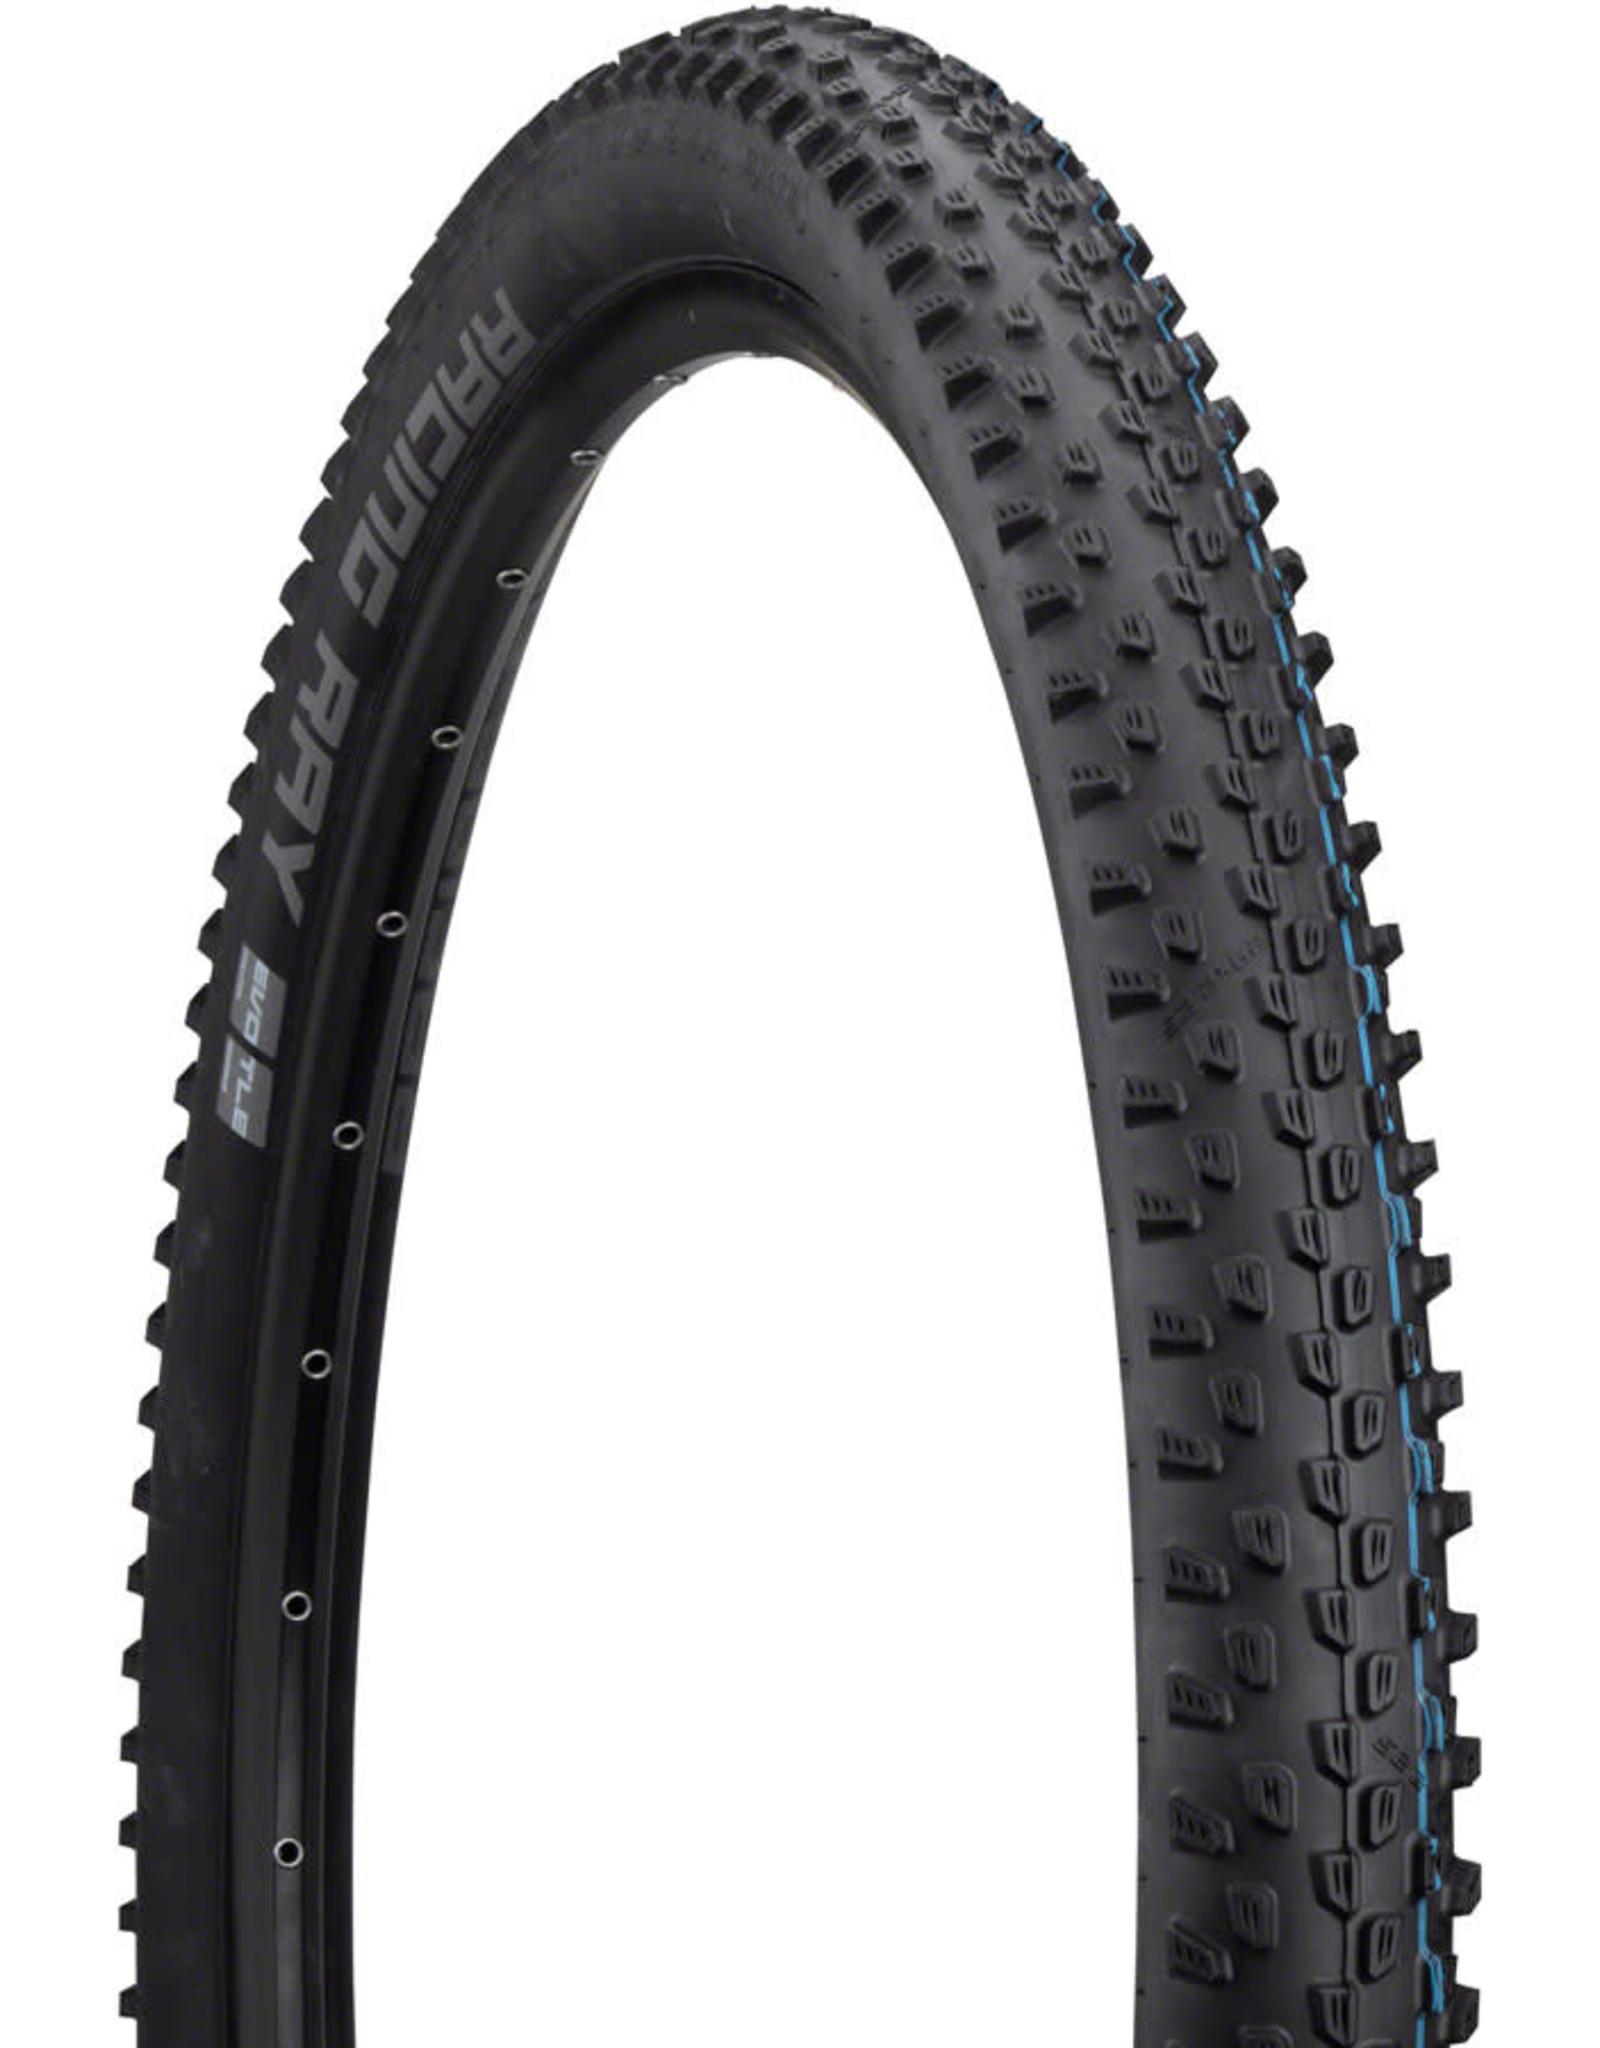 Schwalbe Schwalbe Racing Ray Tire - 29 x 2.35, Tubeless, Folding, Black, Evolution, Super Ground, Addix SpeedGrip